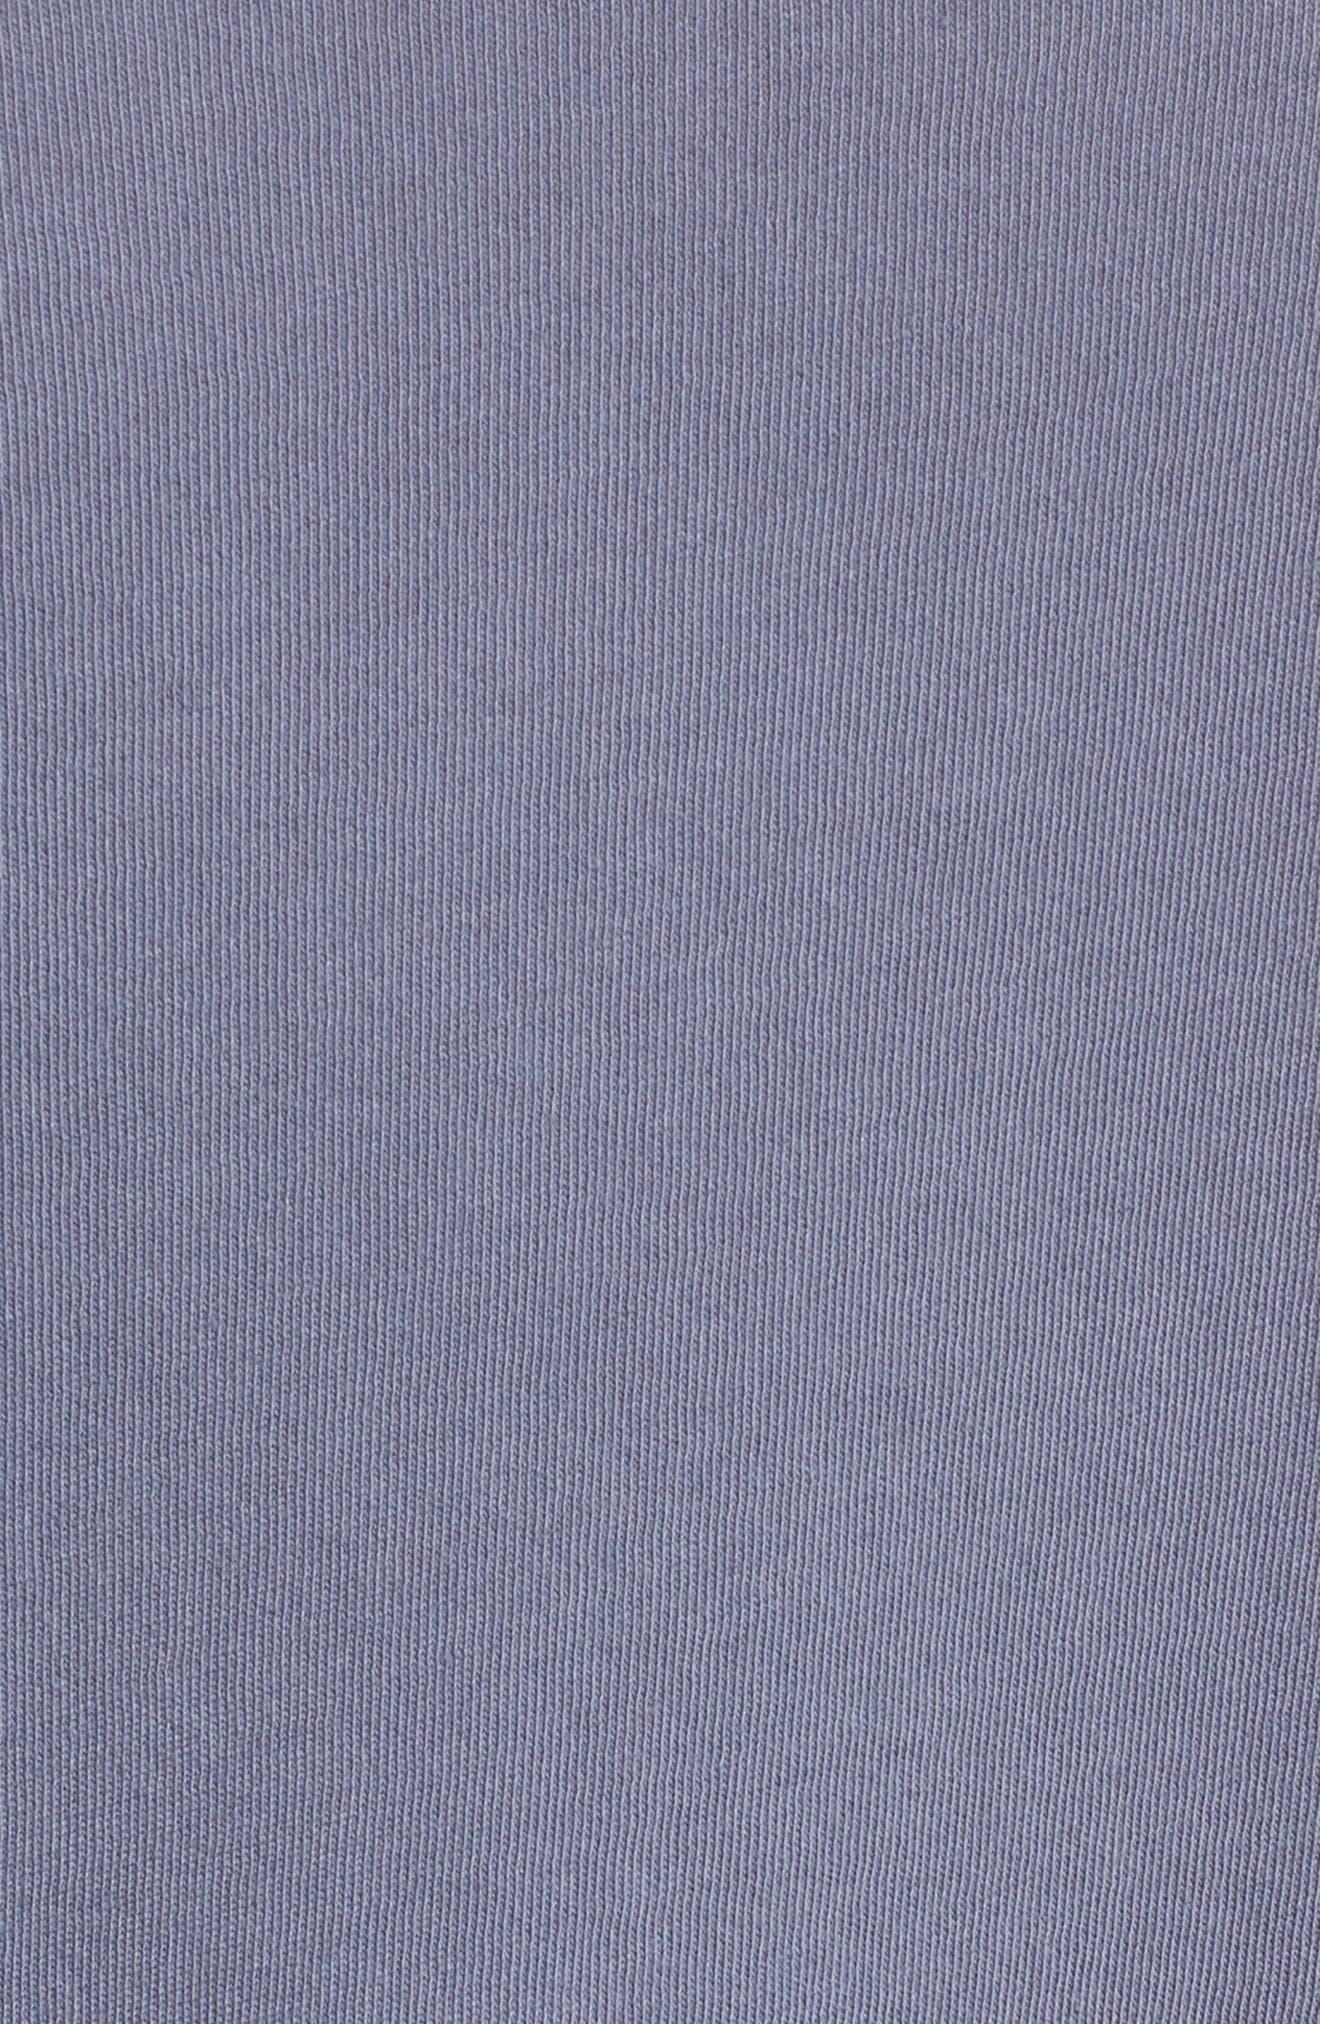 Ruffle Sleeve Knit Top,                             Alternate thumbnail 5, color,                             509